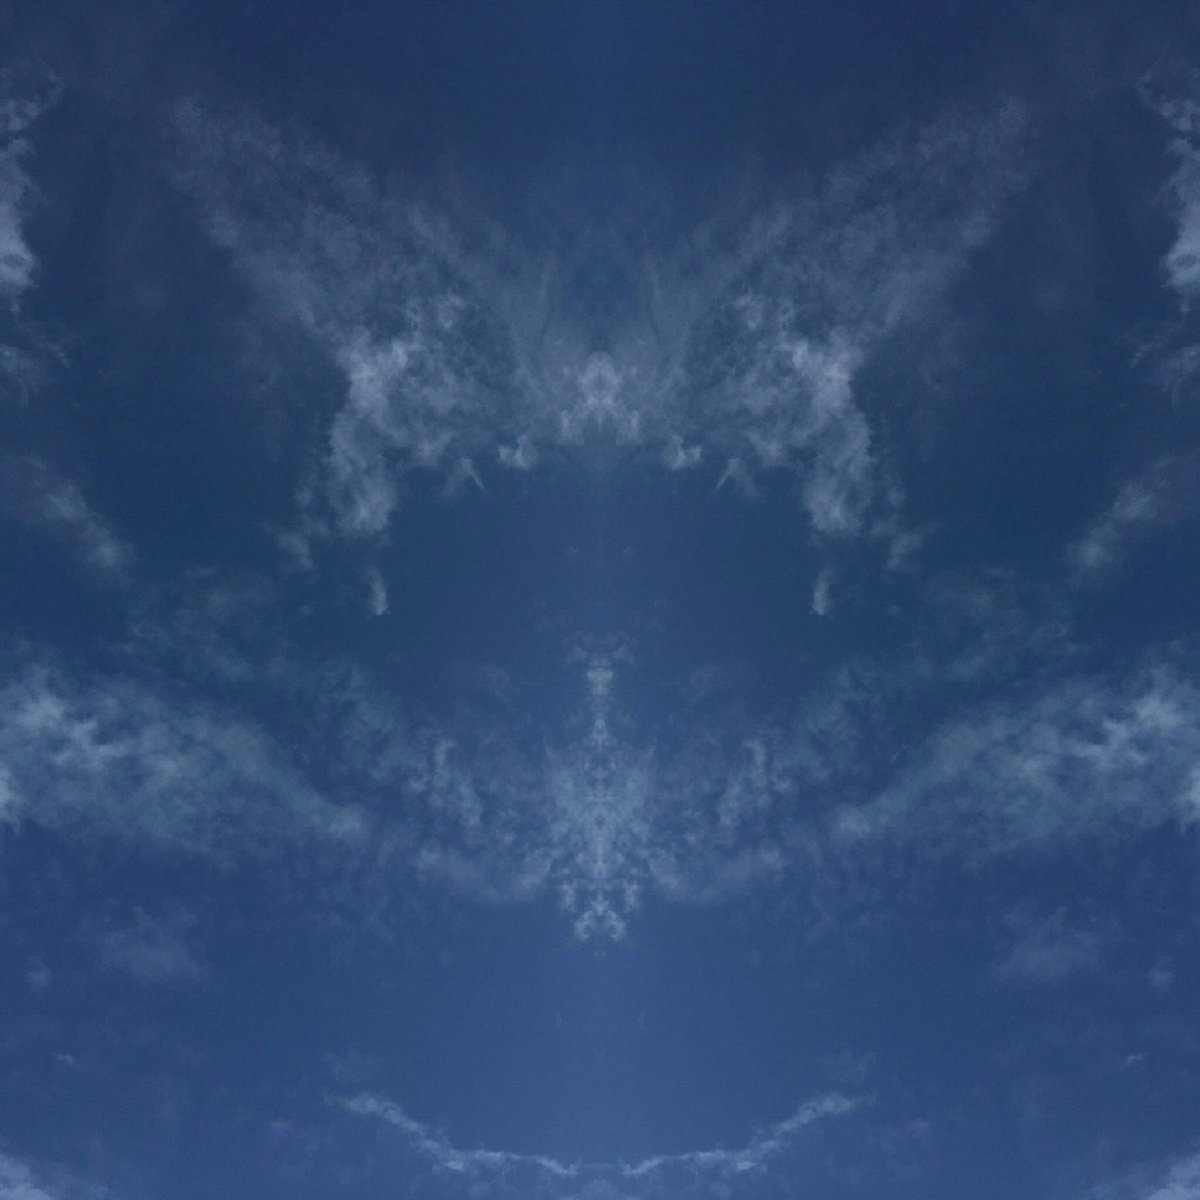 #sky #clouds #weather #nephele #divination #aeromancy #digitaledit #edits #edit #mirrorlab #ascendedmasters #Angel #Angels #wicca #magic #lightworker #indigo #starseed #lifepath9 #aliens #alternateuniverse #multidimensional #blueseraphim #blueavians #artpic.twitter.com/0HzyJwqyqu